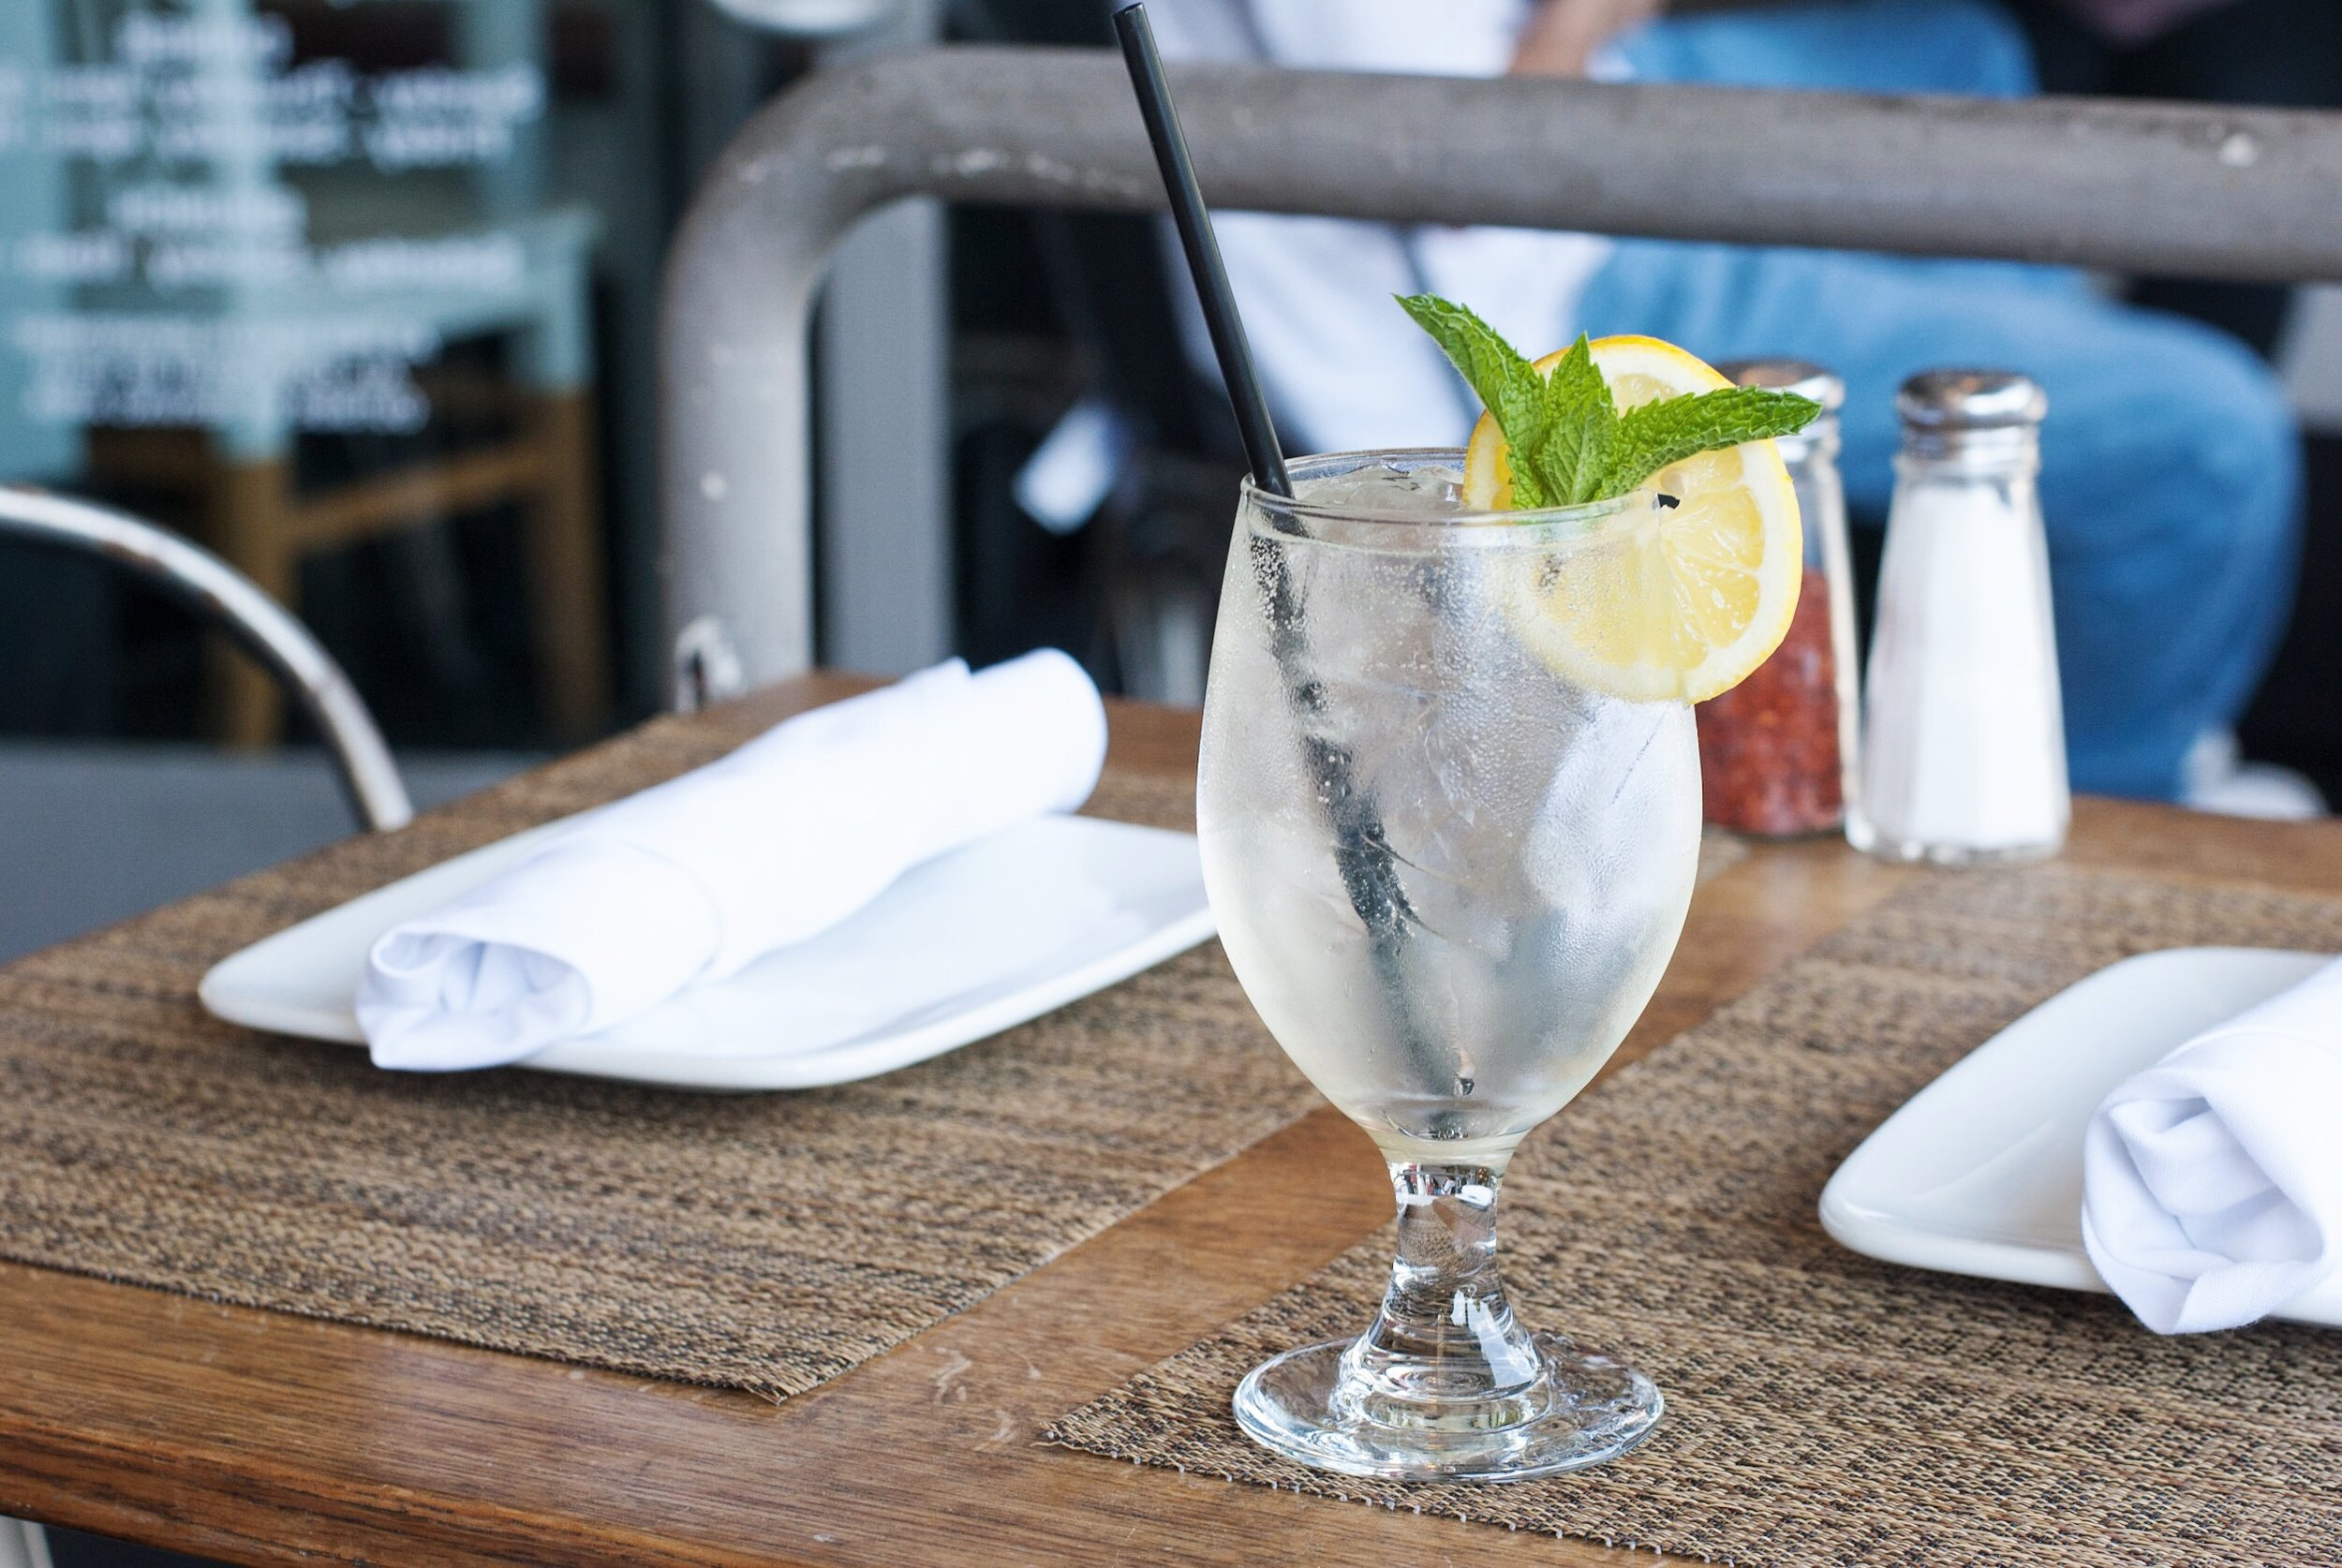 Med Breeze Cocktail at Momed, Beverly Hills - Brunchographers